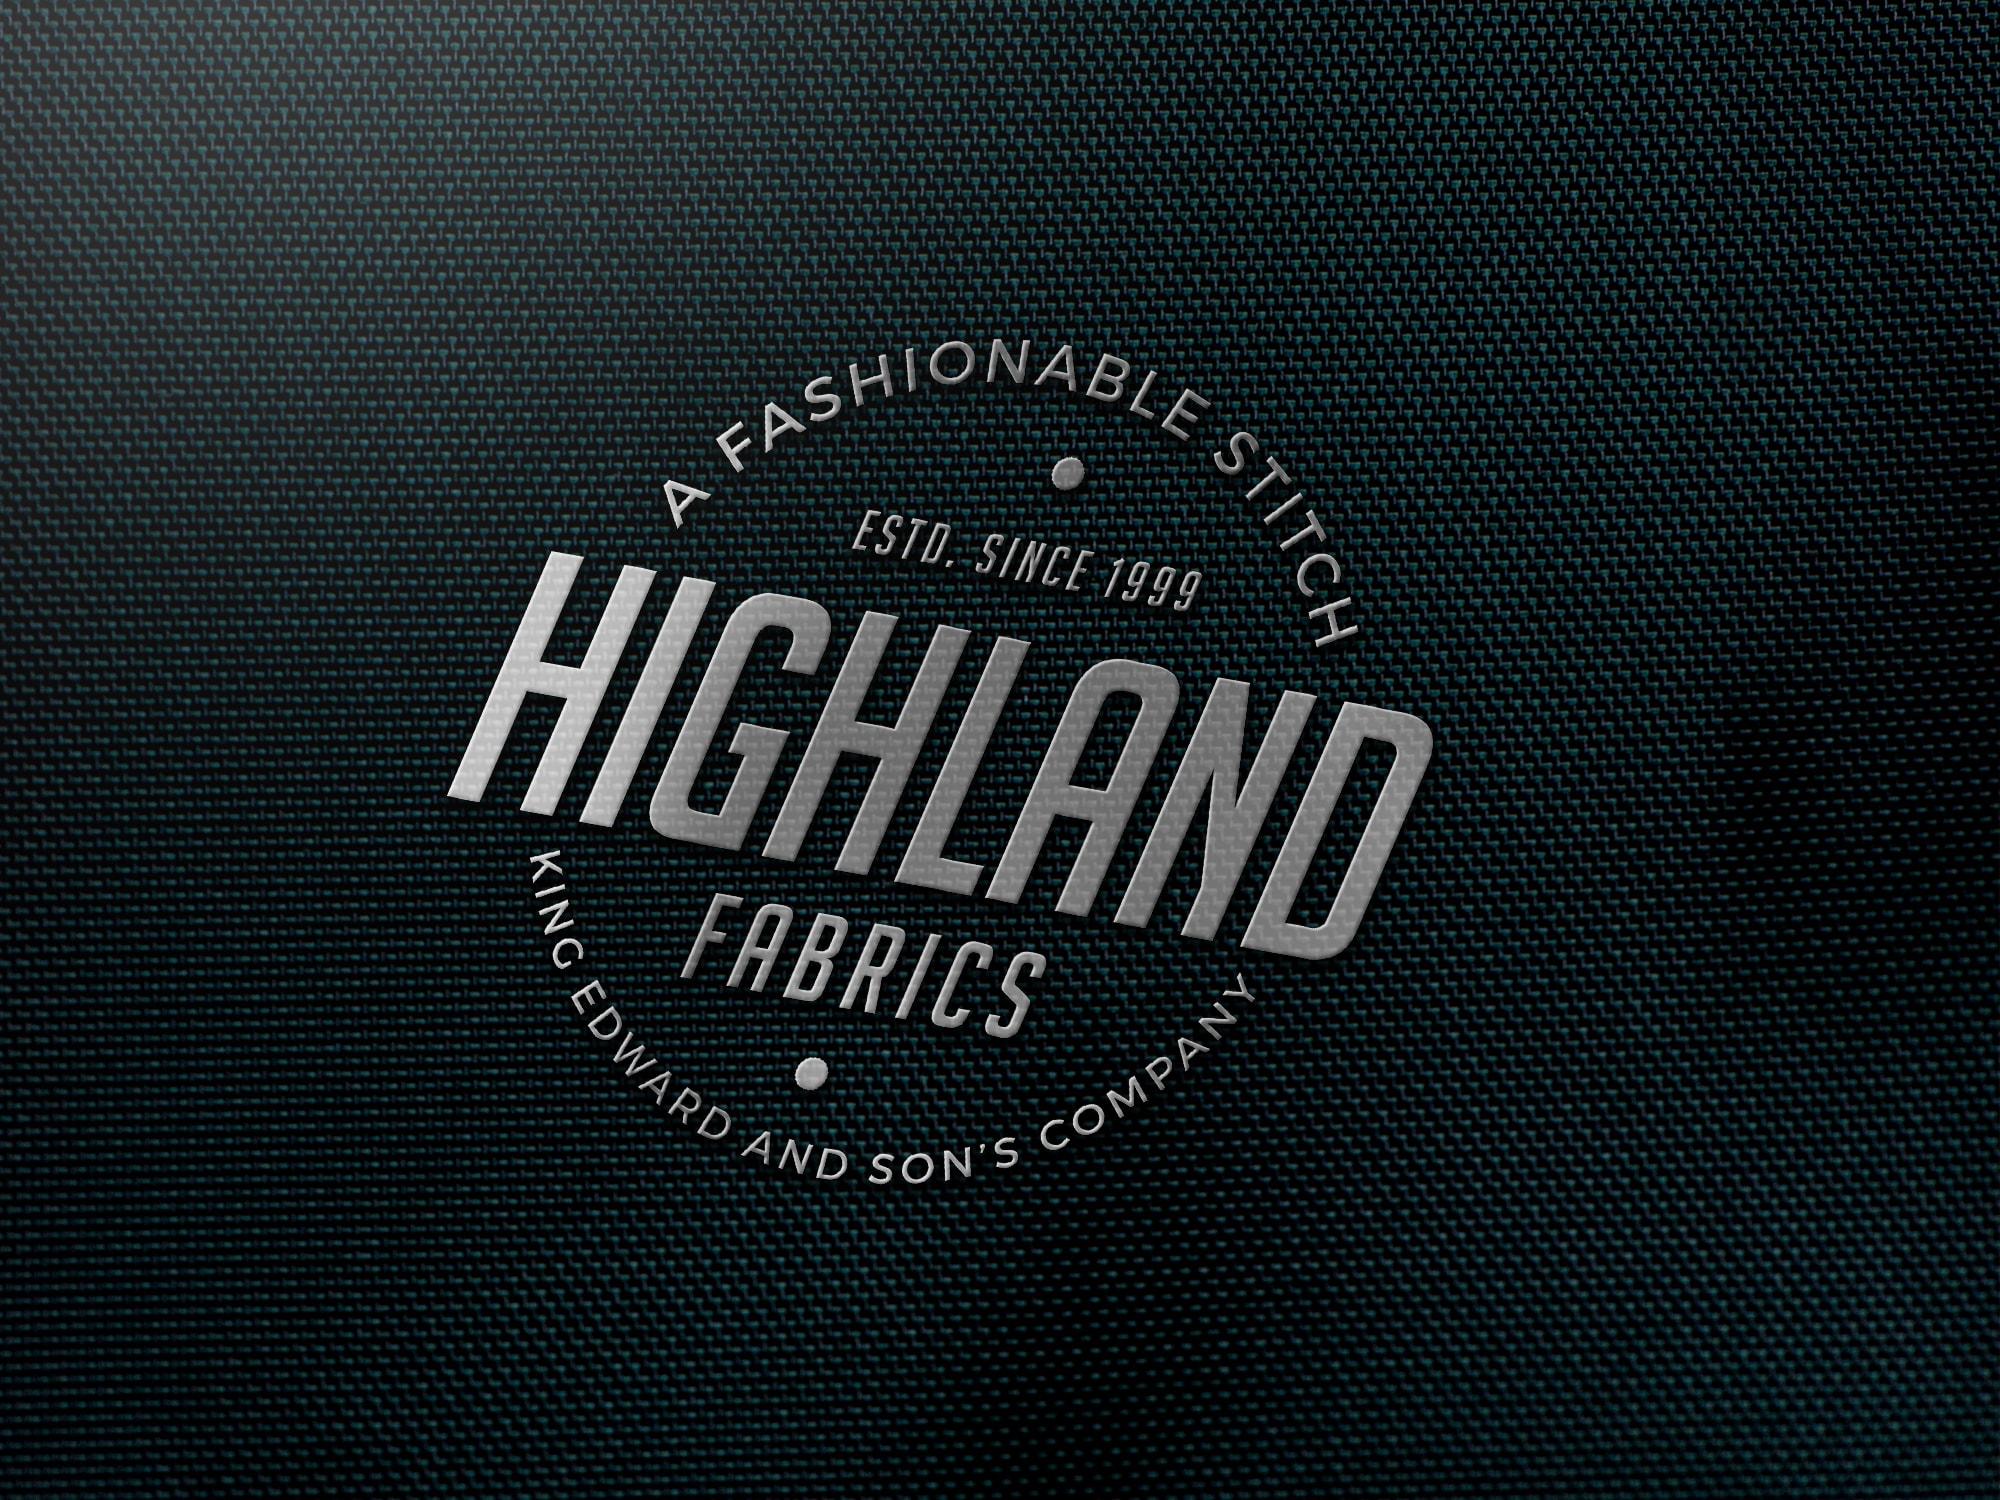 fabric-logo-mockup-230514717-min